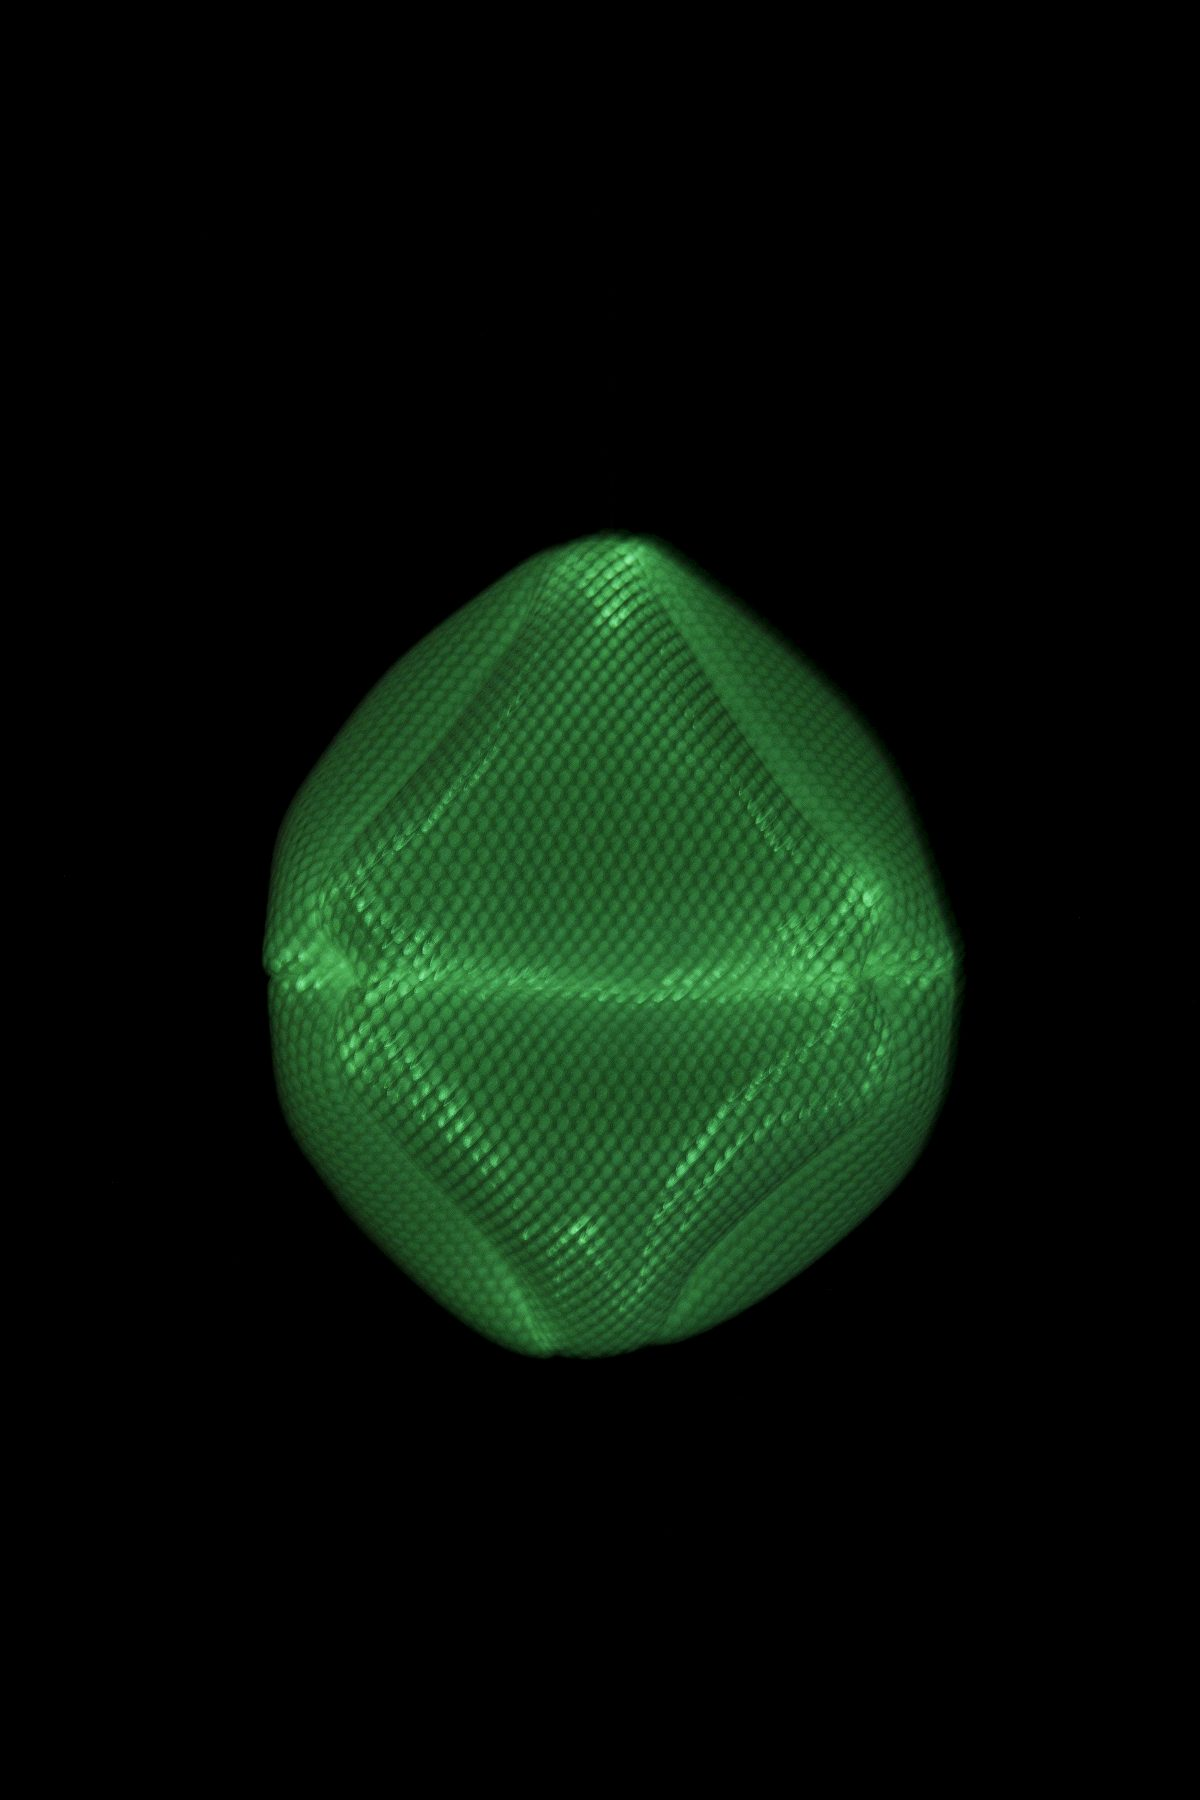 Radiolaria Ovulus Coralli glow-in-the-dark hanglamp van Bernotat